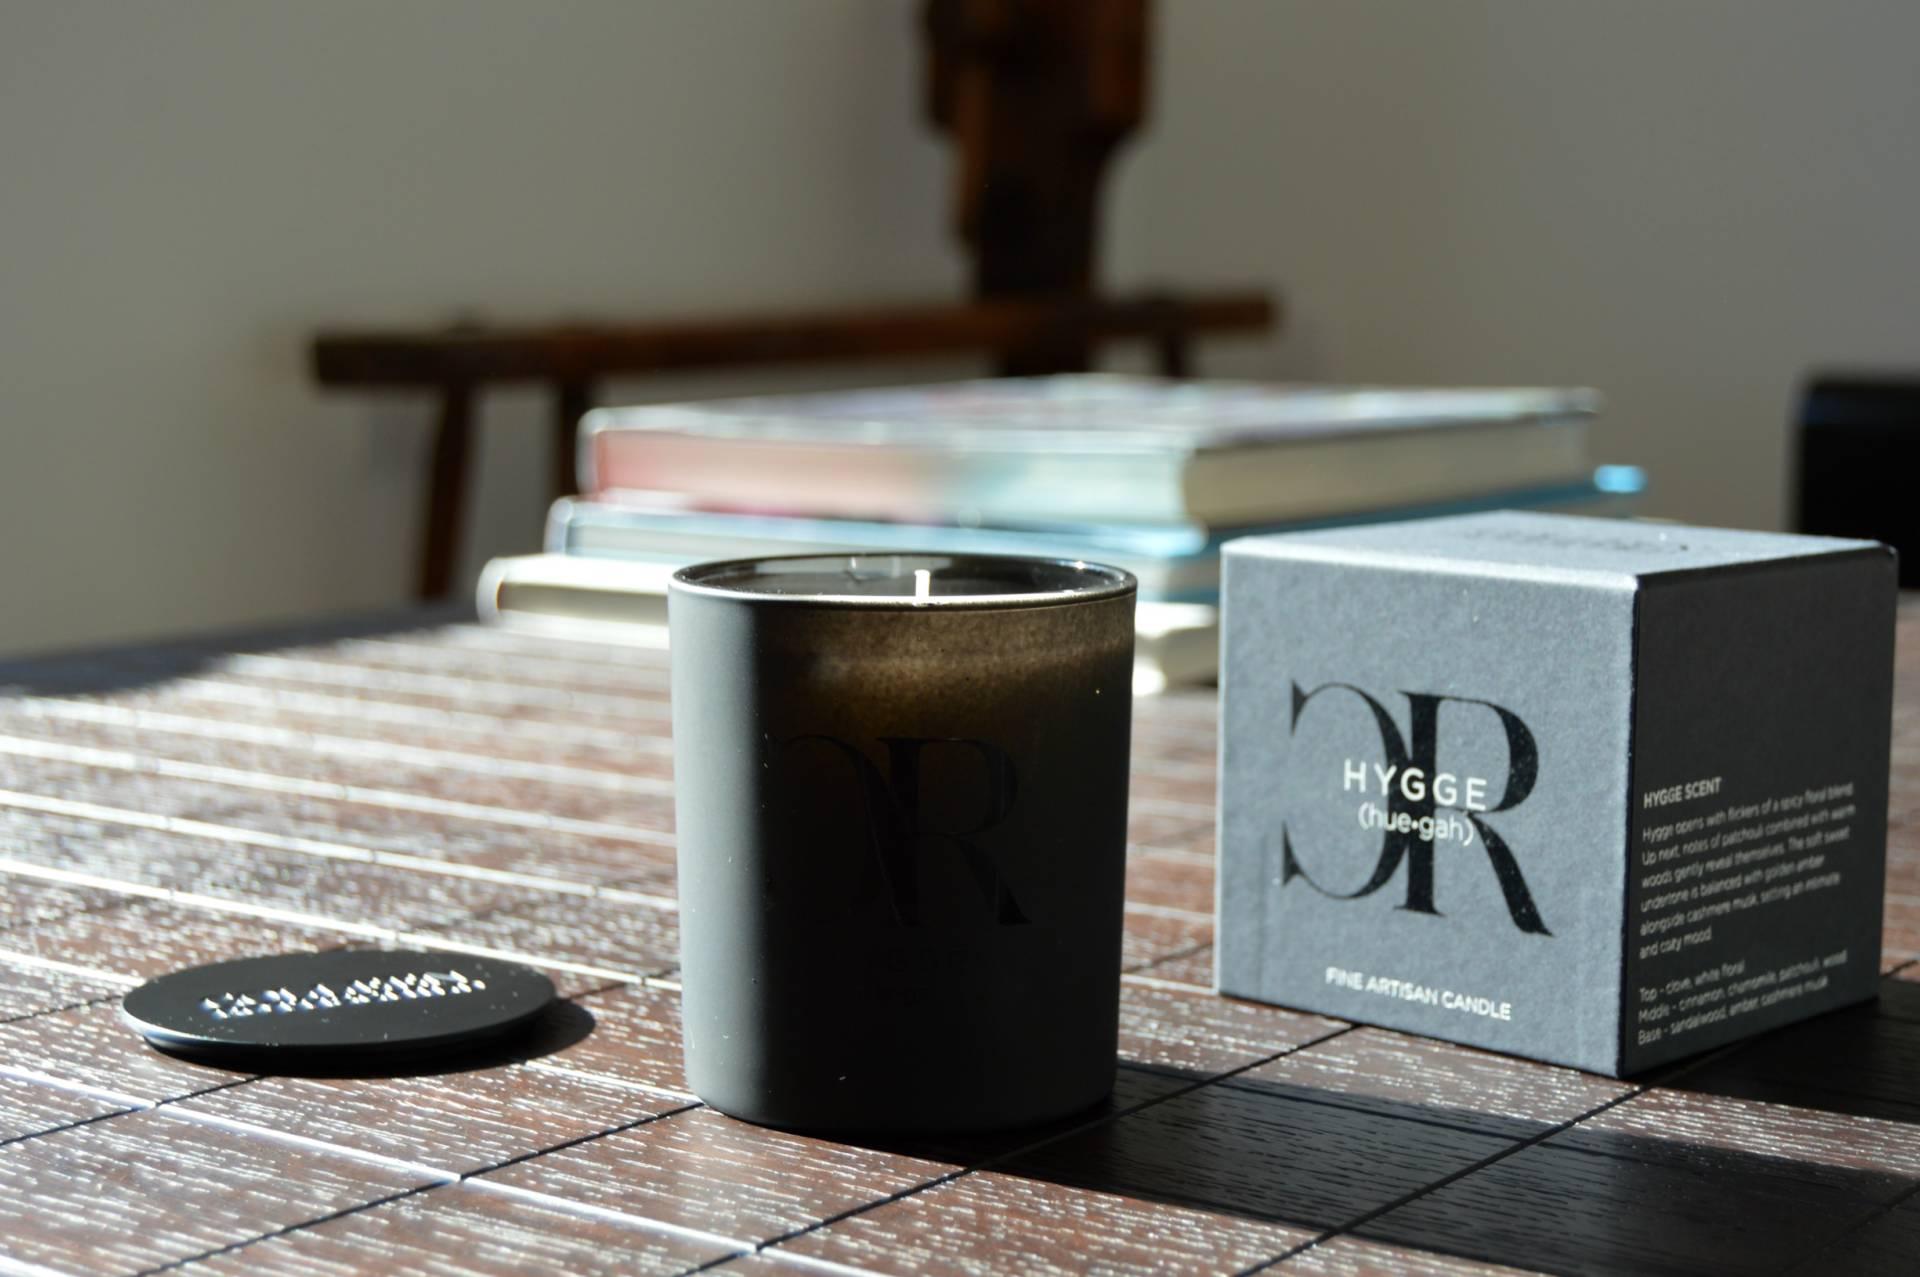 colleen-rothschild-hygge-candle-inhautepursuit-favorite-candles-blog